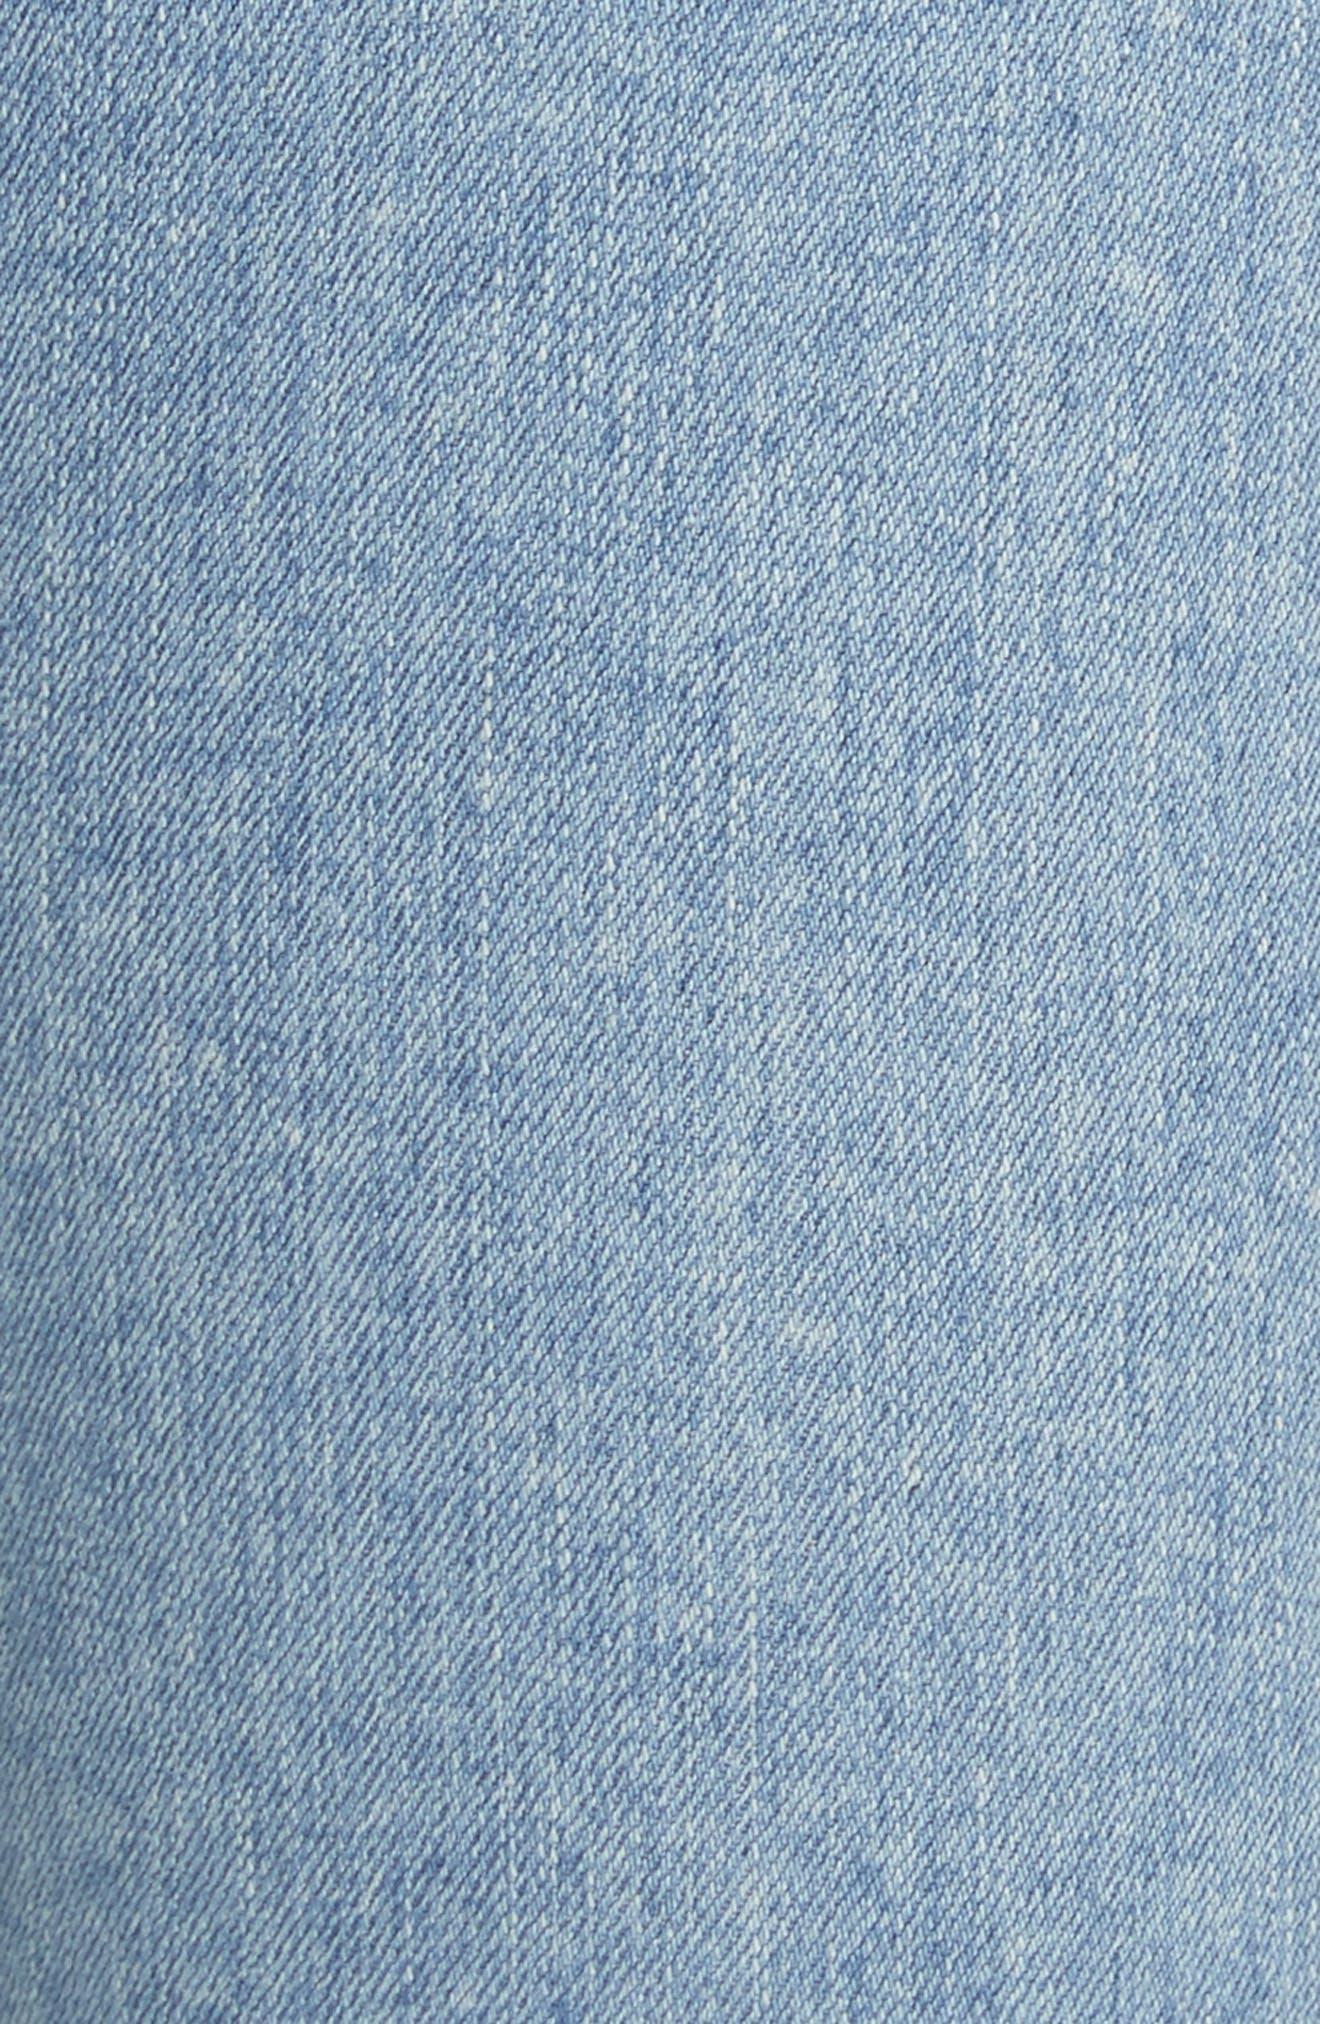 Phila Skinny Jeans,                             Alternate thumbnail 5, color,                             Nelly/ Prairie